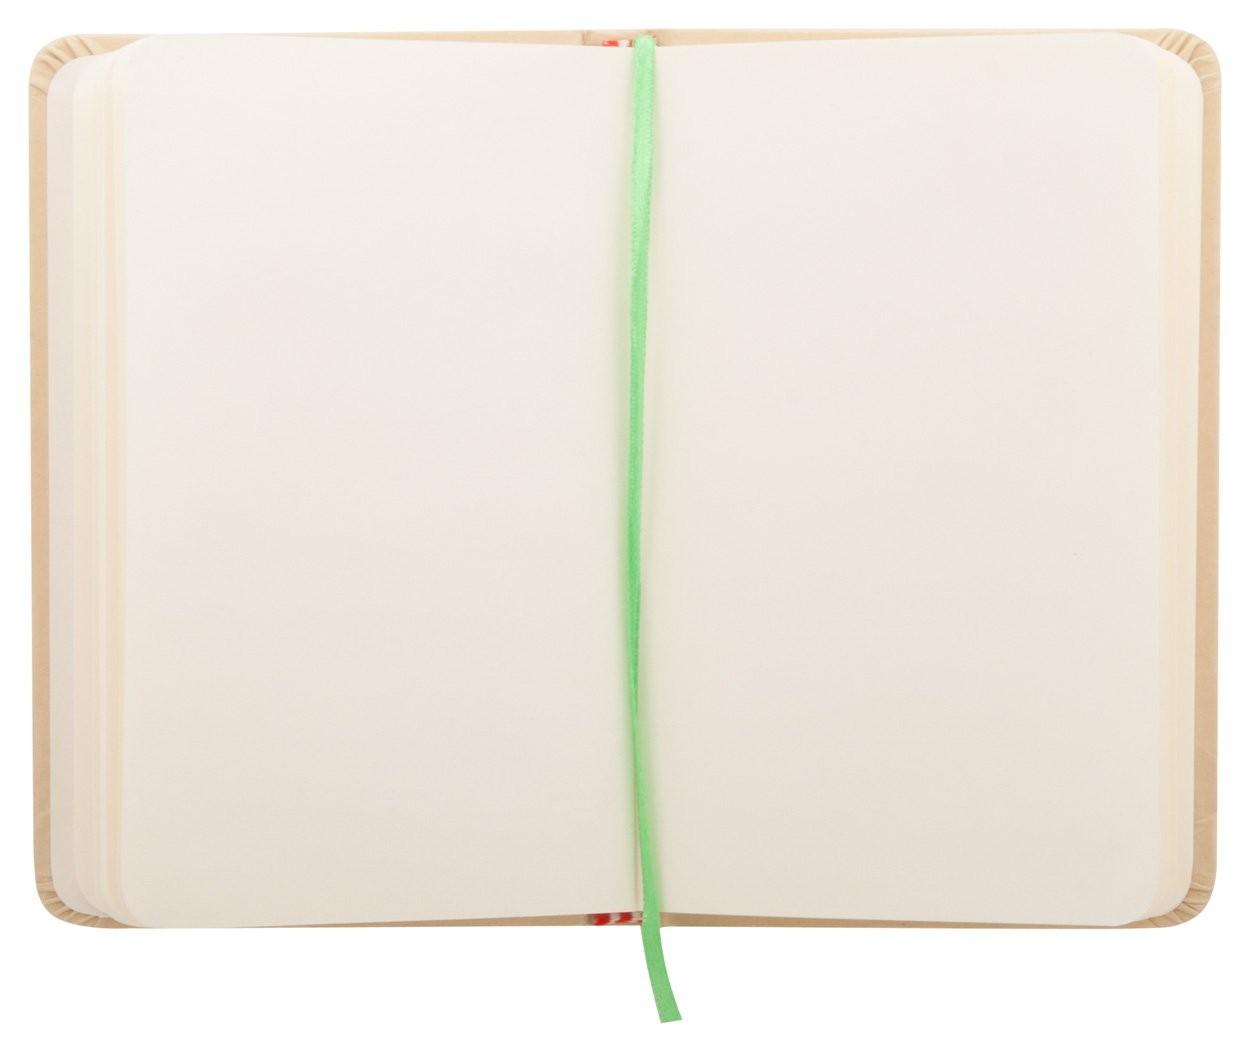 Notizheft aus Recycling Papier. Econotes, Ansicht 3